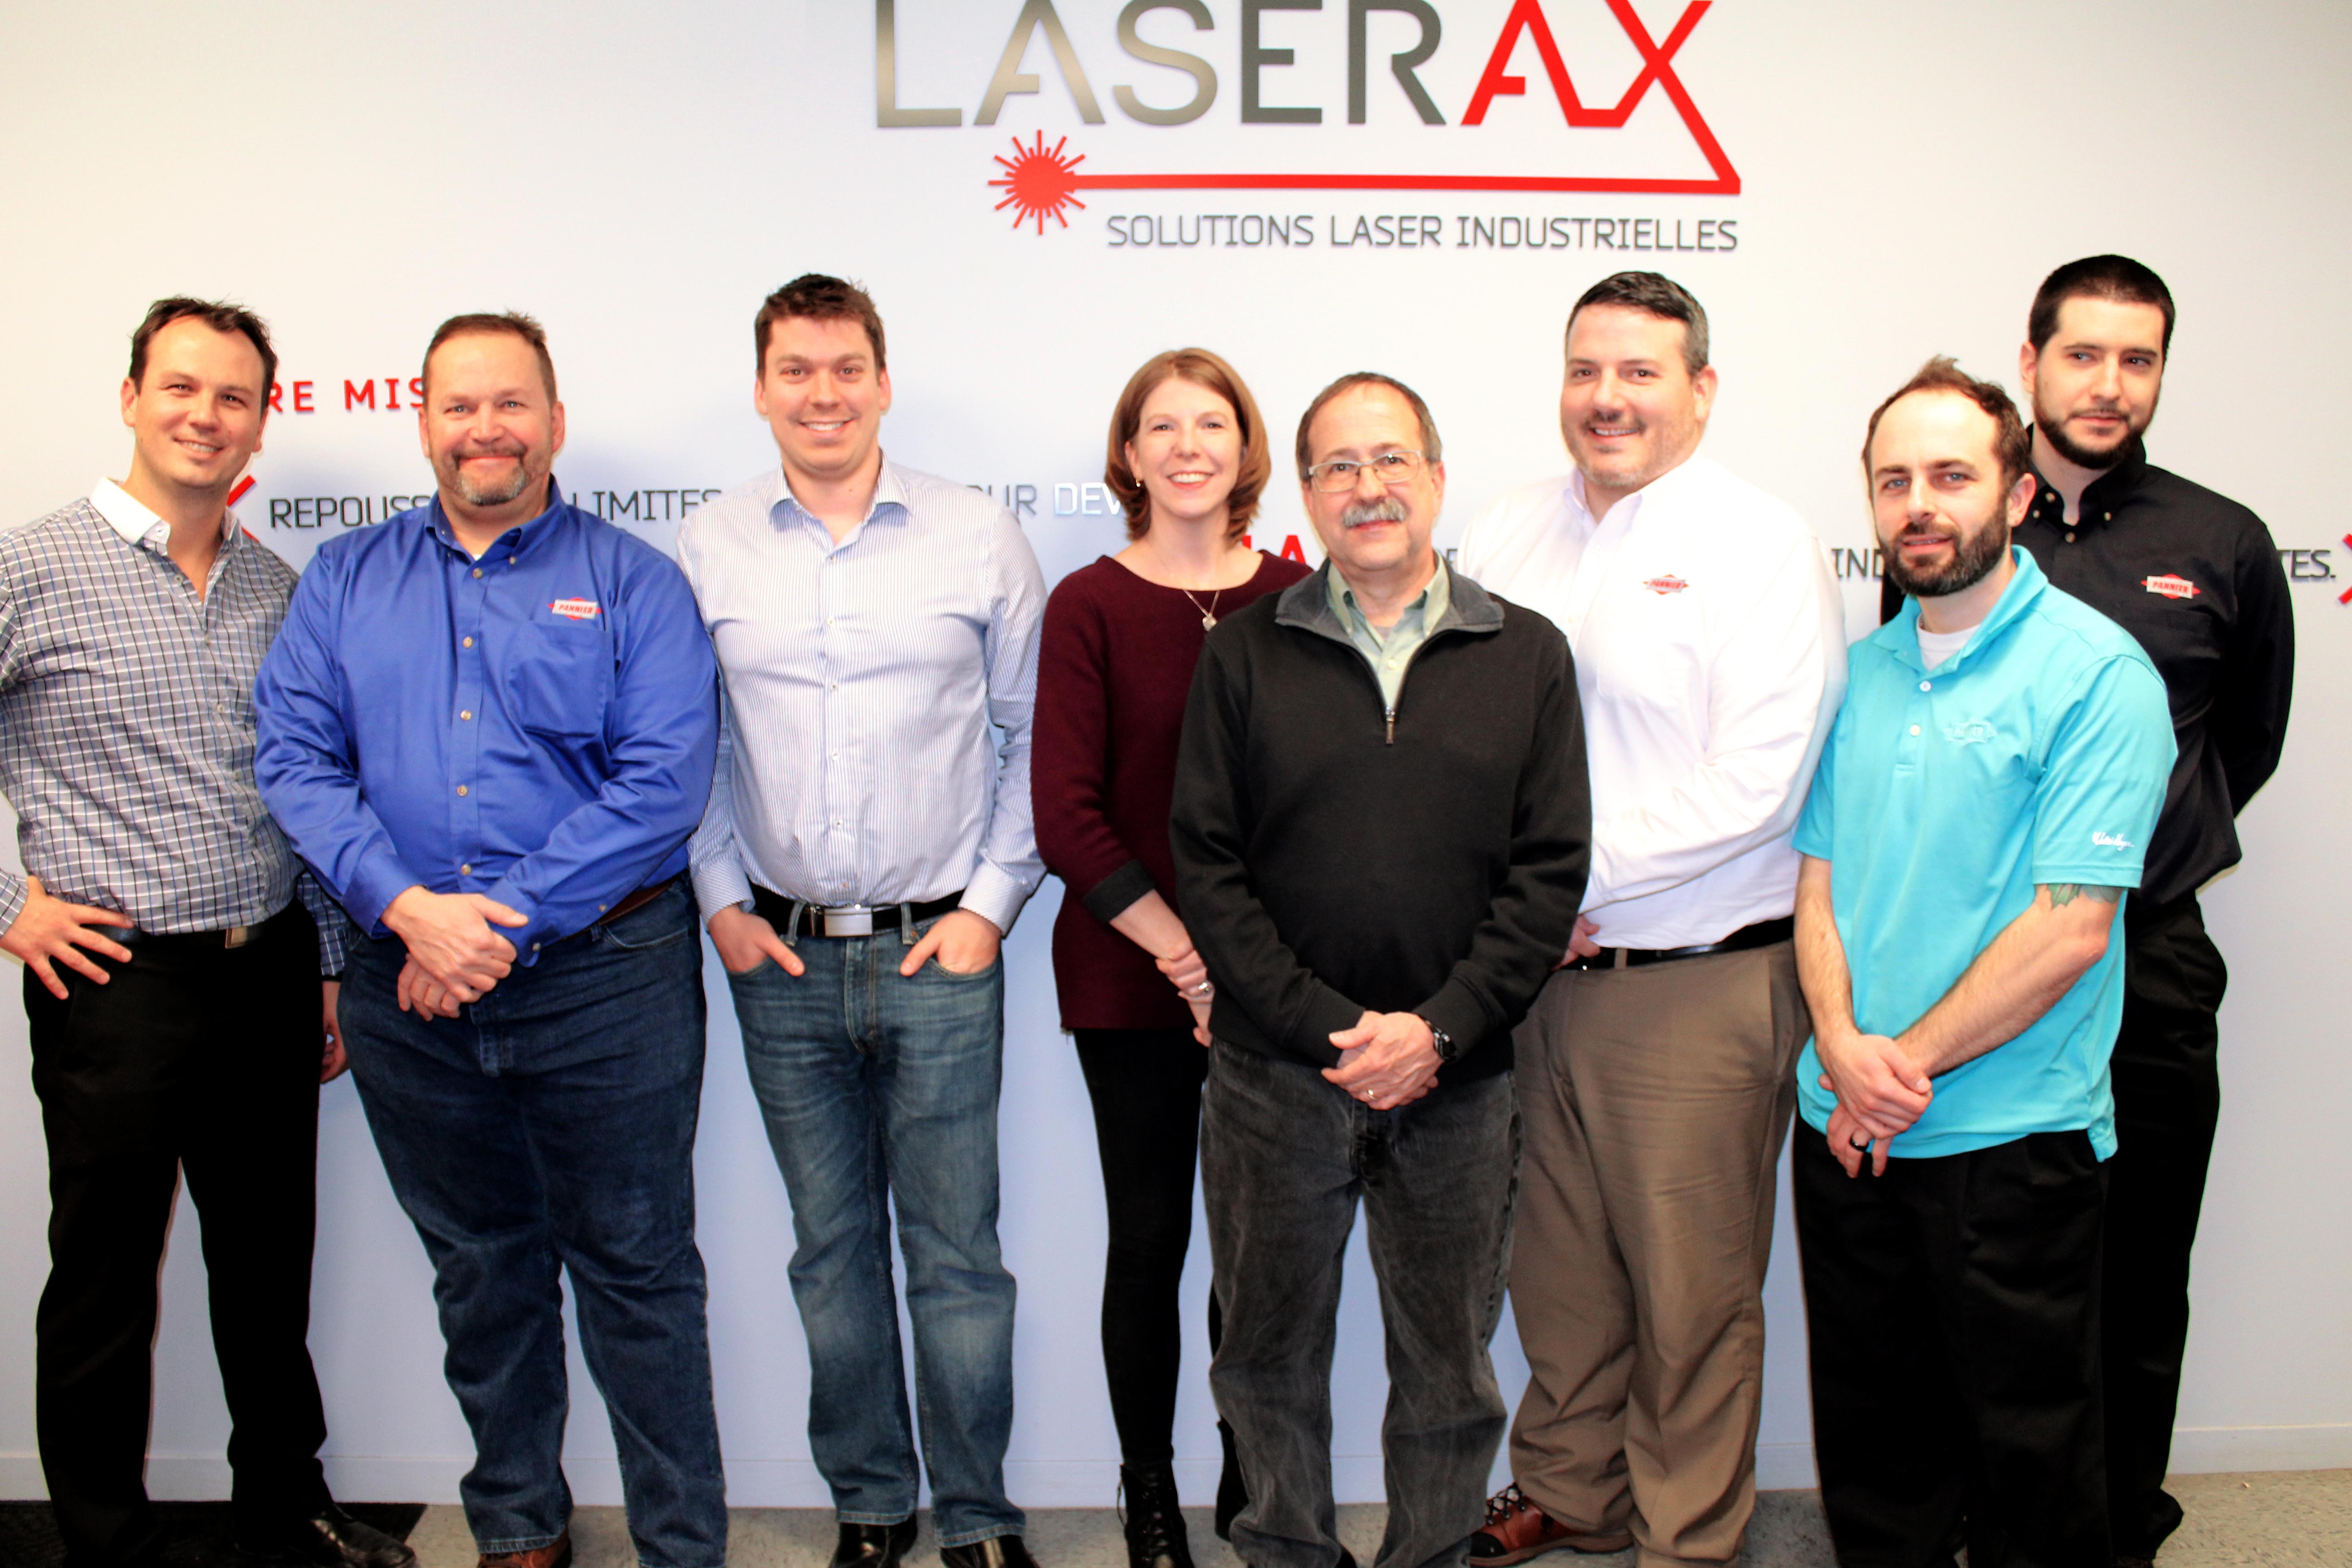 Partnership Pannier-Laserax Extended Team